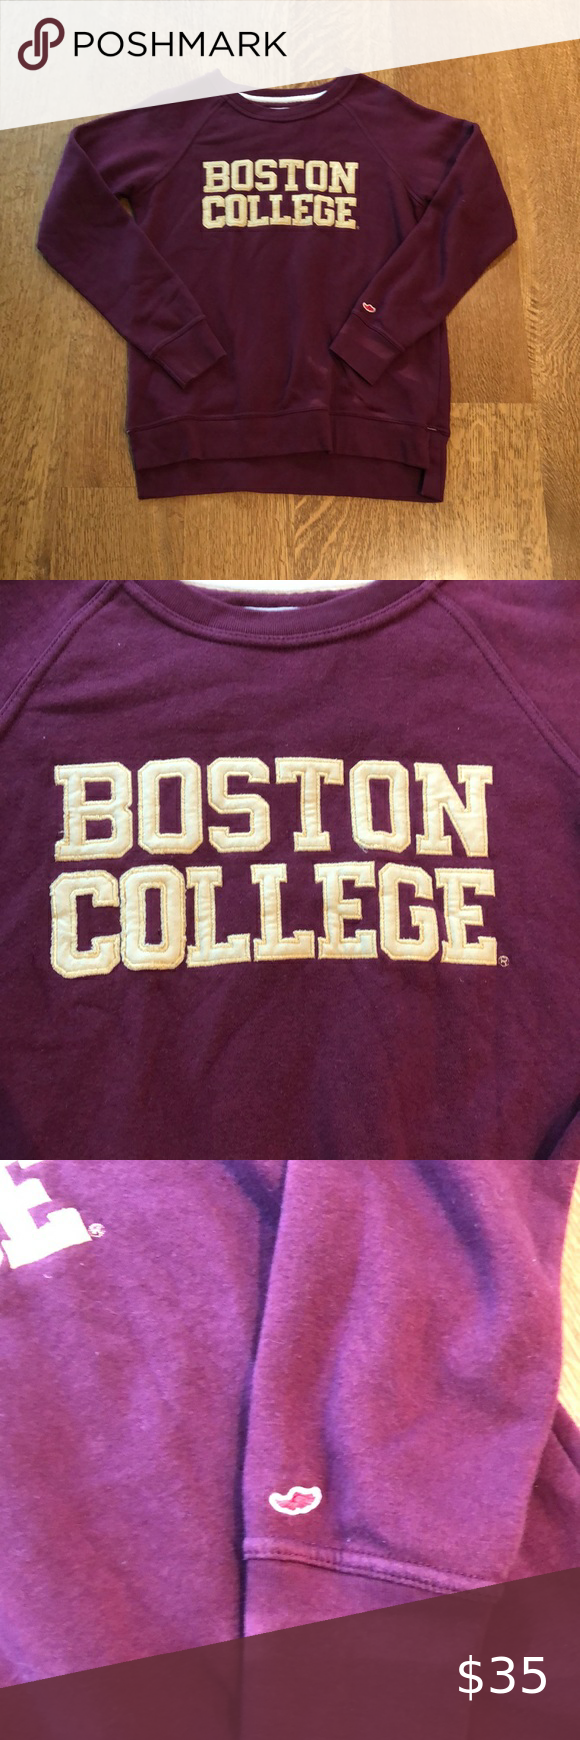 League Boston College Crewneck Maroon Sweatshirt S Sweatshirts Maroon Sweatshirt Sweatshirt Tops [ 1740 x 580 Pixel ]